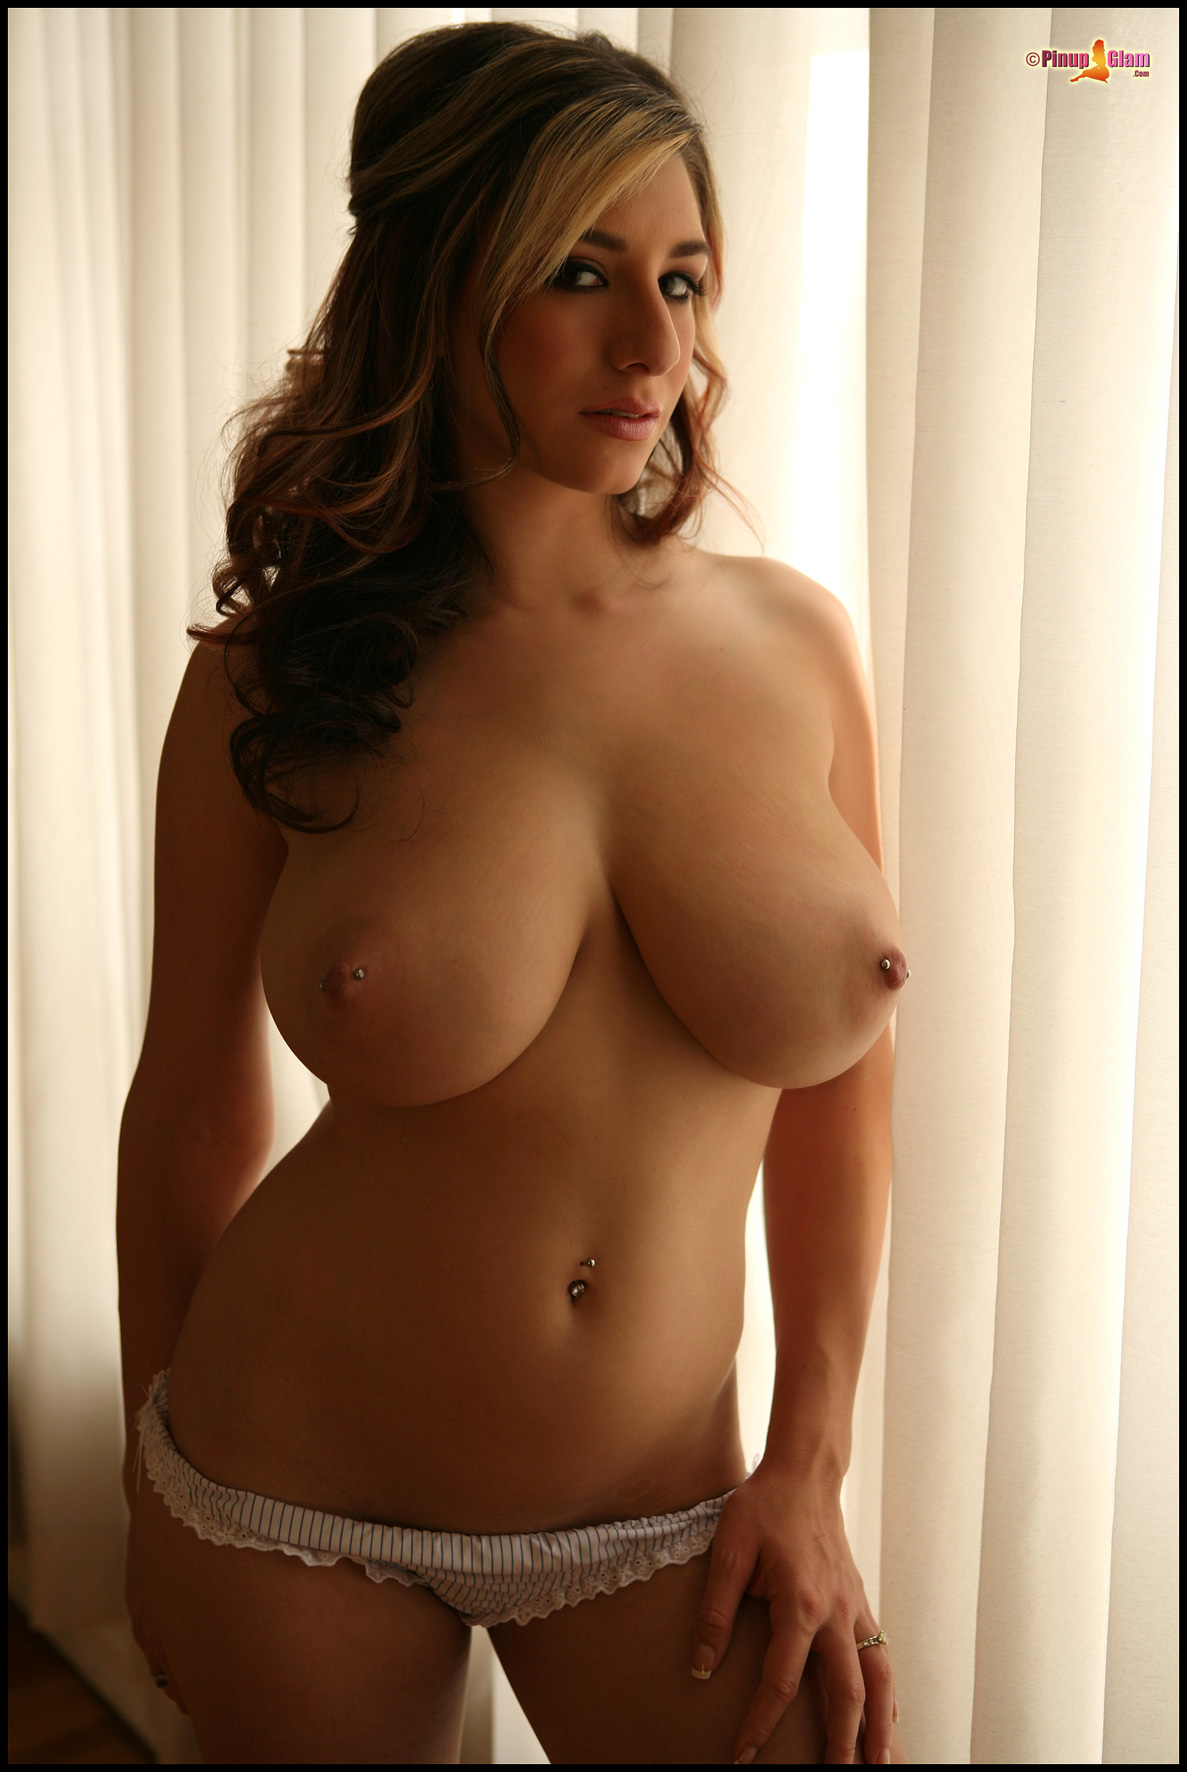 Christian girl nude videos